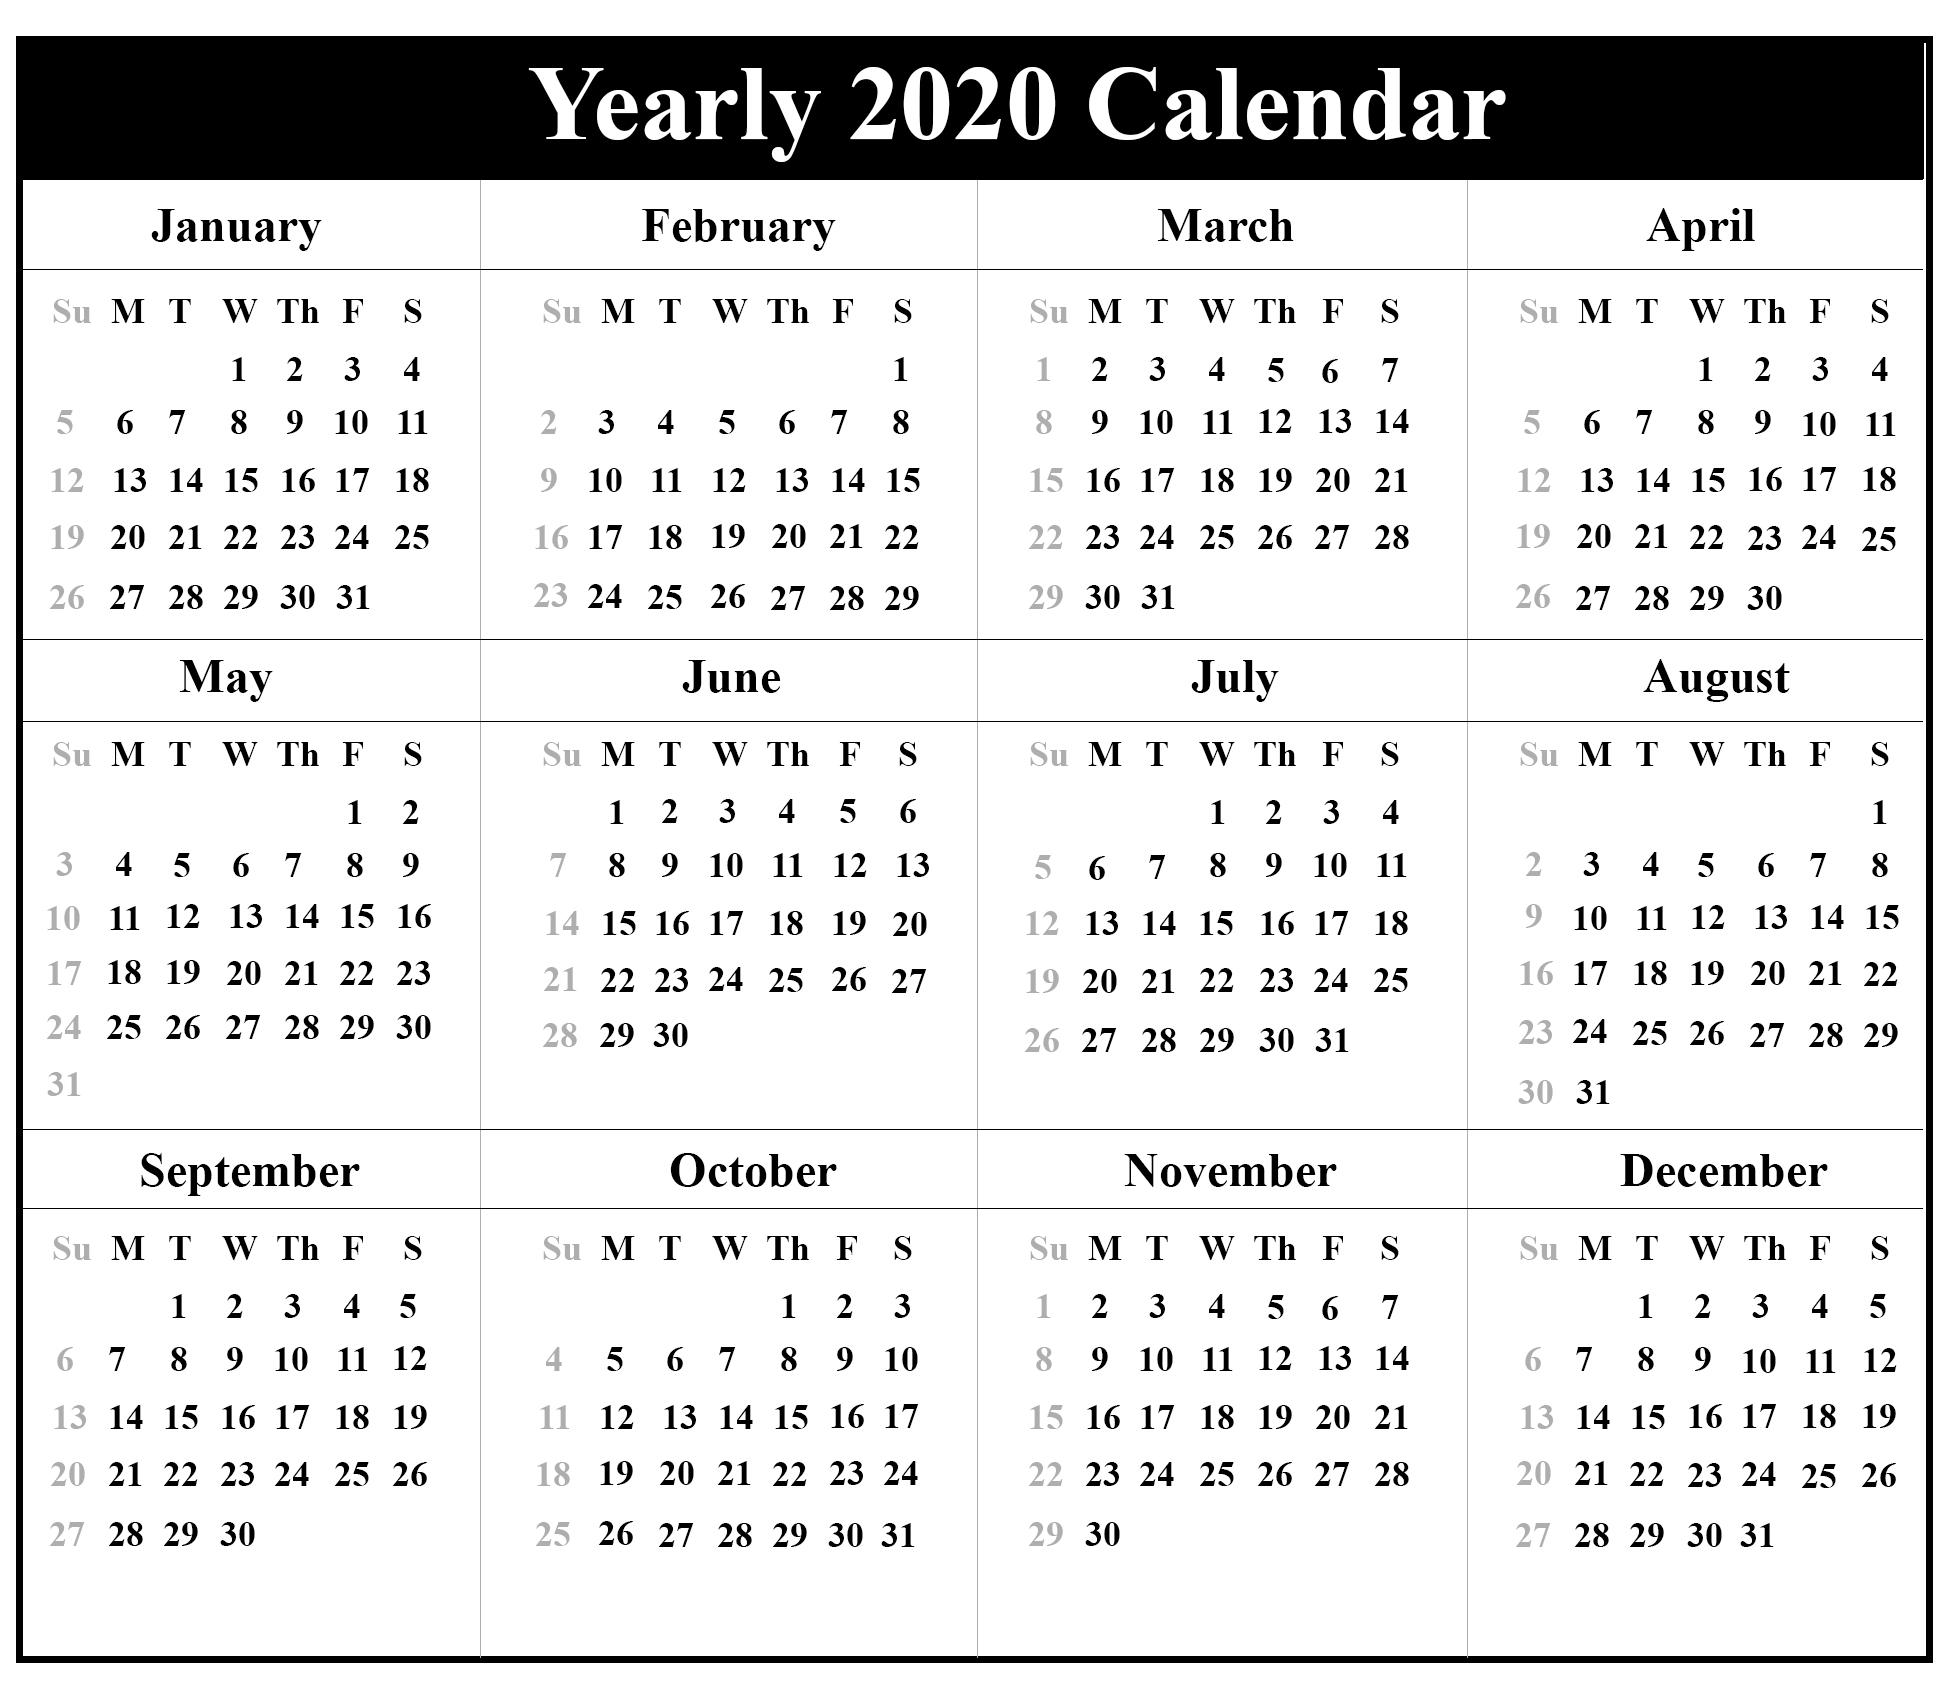 Islamic Calendar 2019 2020 - Google Search